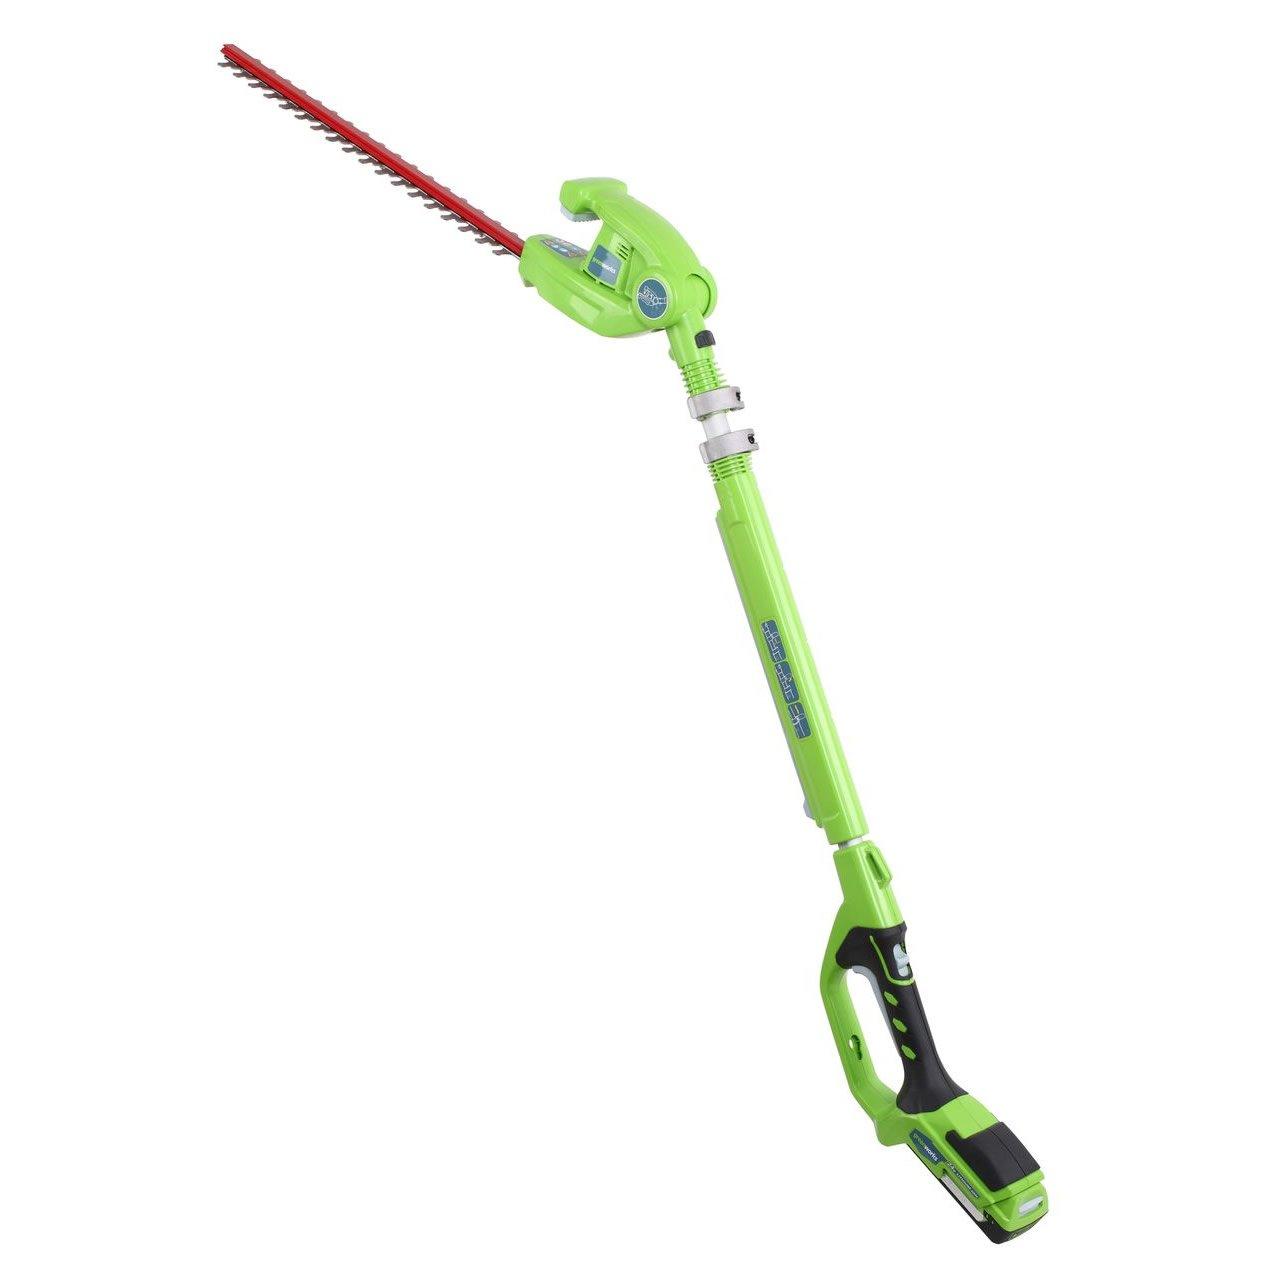 Greenworks 24v Long Reach Cordless Hedge Trimmer (22157T)